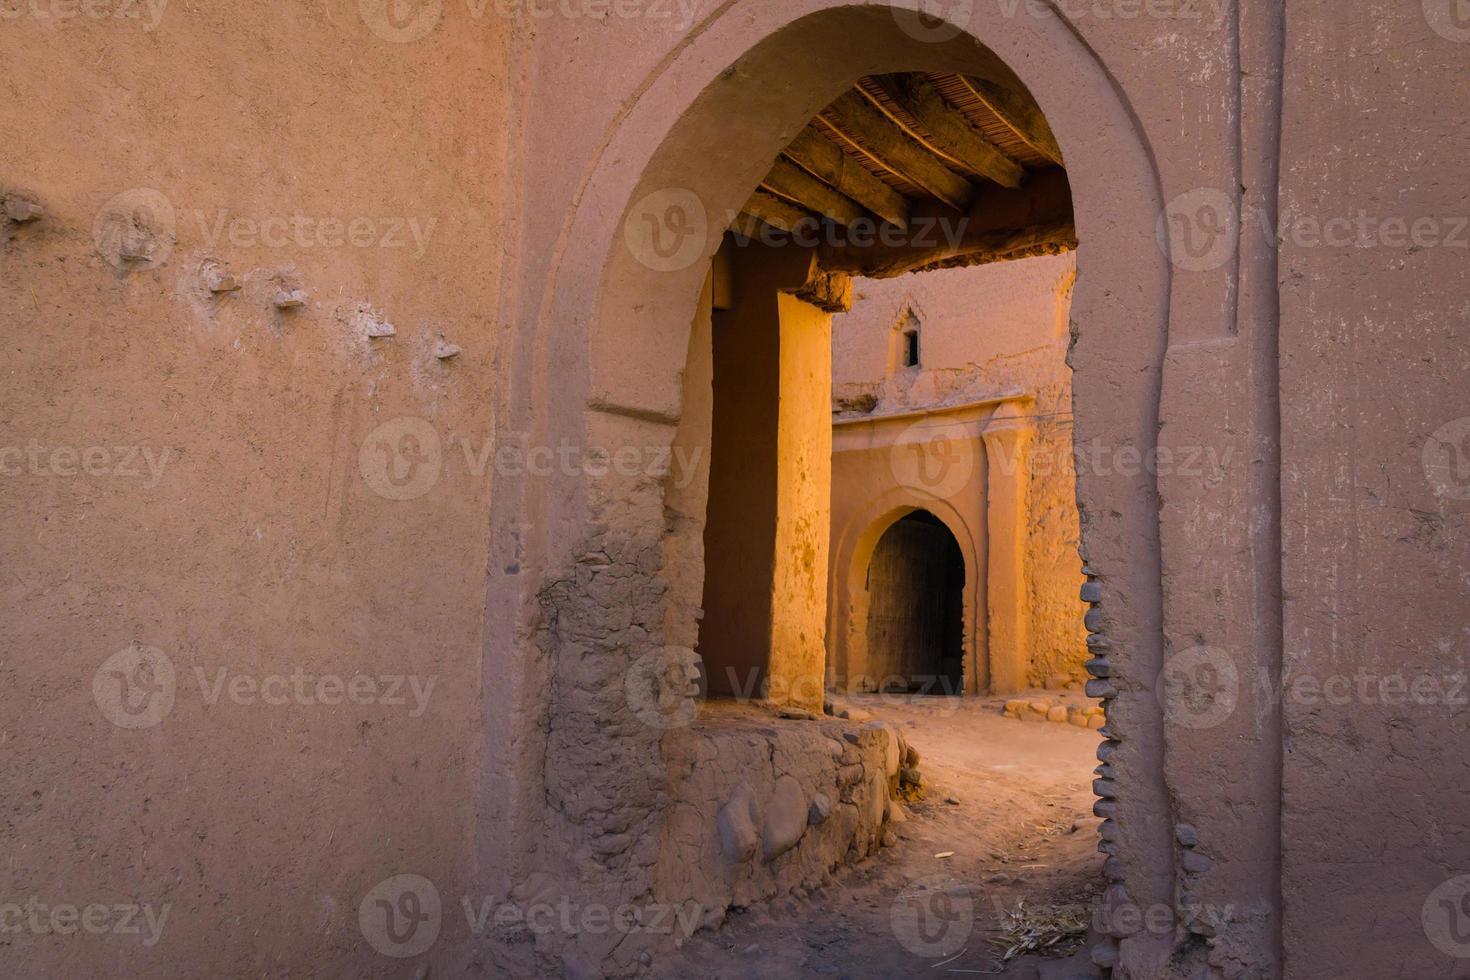 arquitectura de marruecos foto